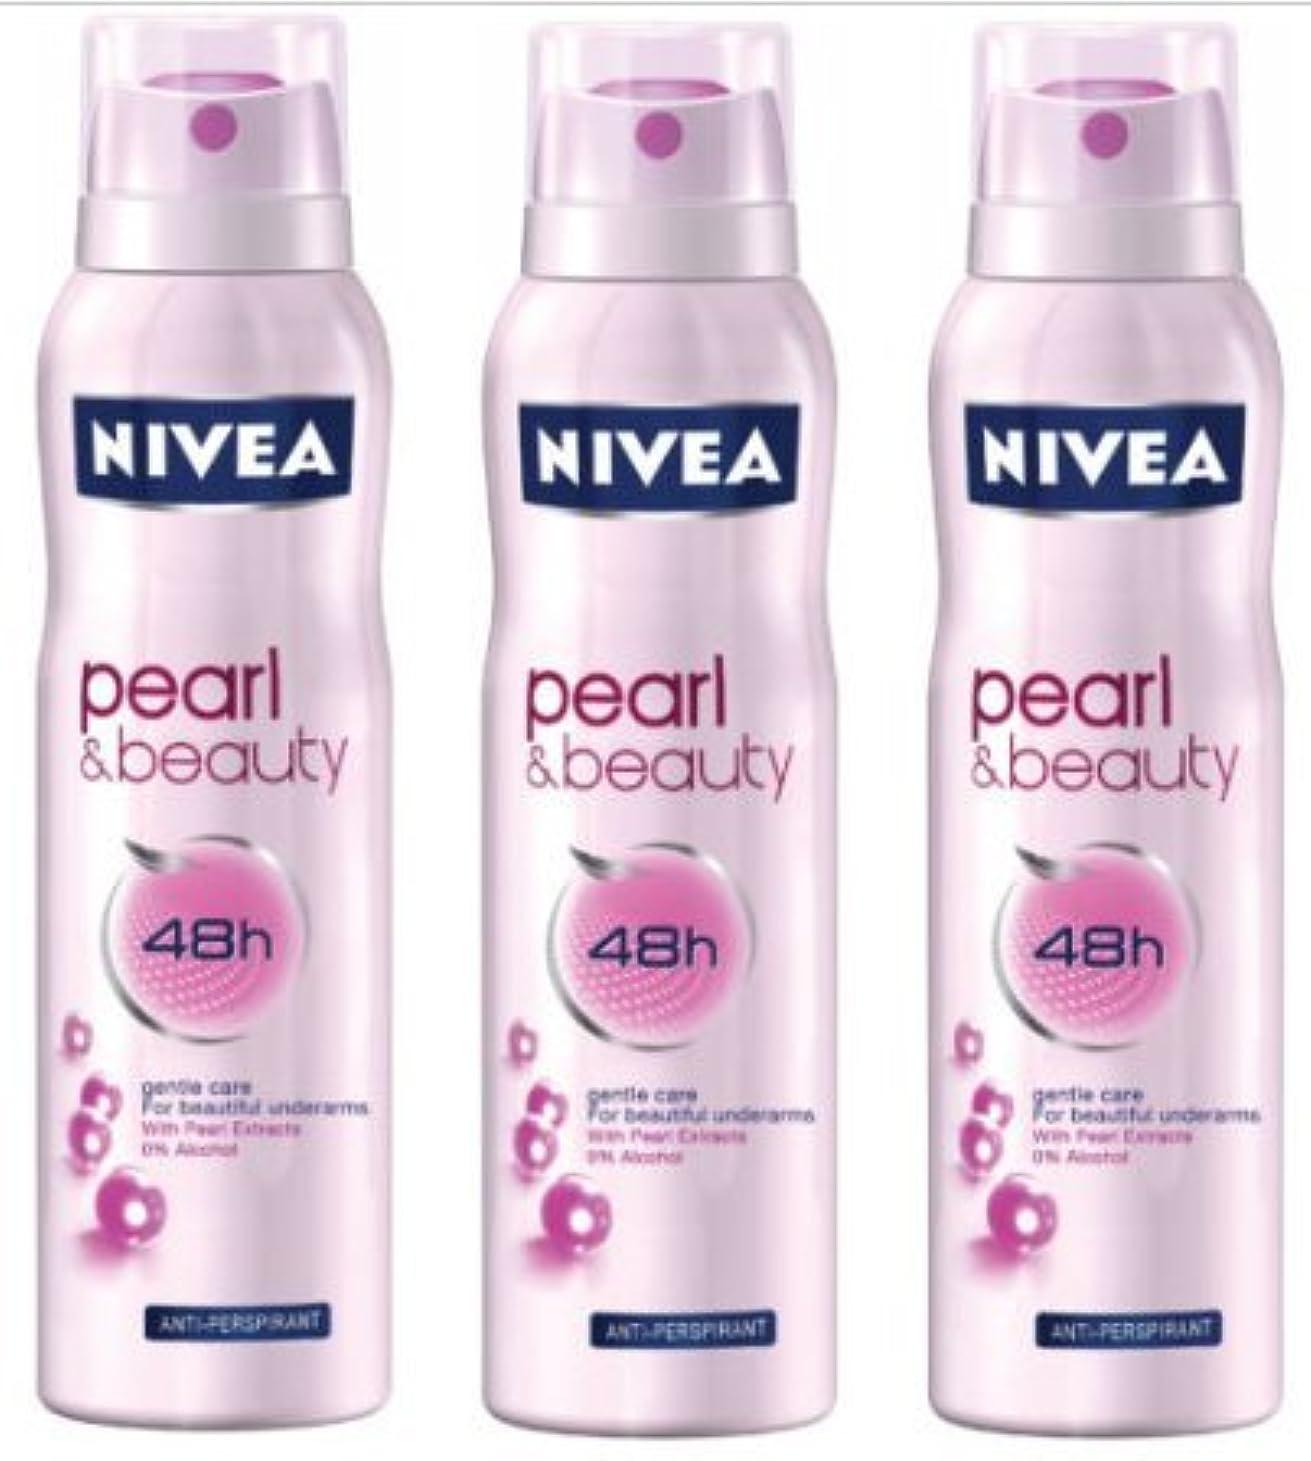 3 Nivea Pearl & Beauty Spray Deodorant Anti-perspirant 150ml - India - 並行輸入品 - 3 xニベアパール&ビューティスプレーデオドラントアンチパーマプライ...